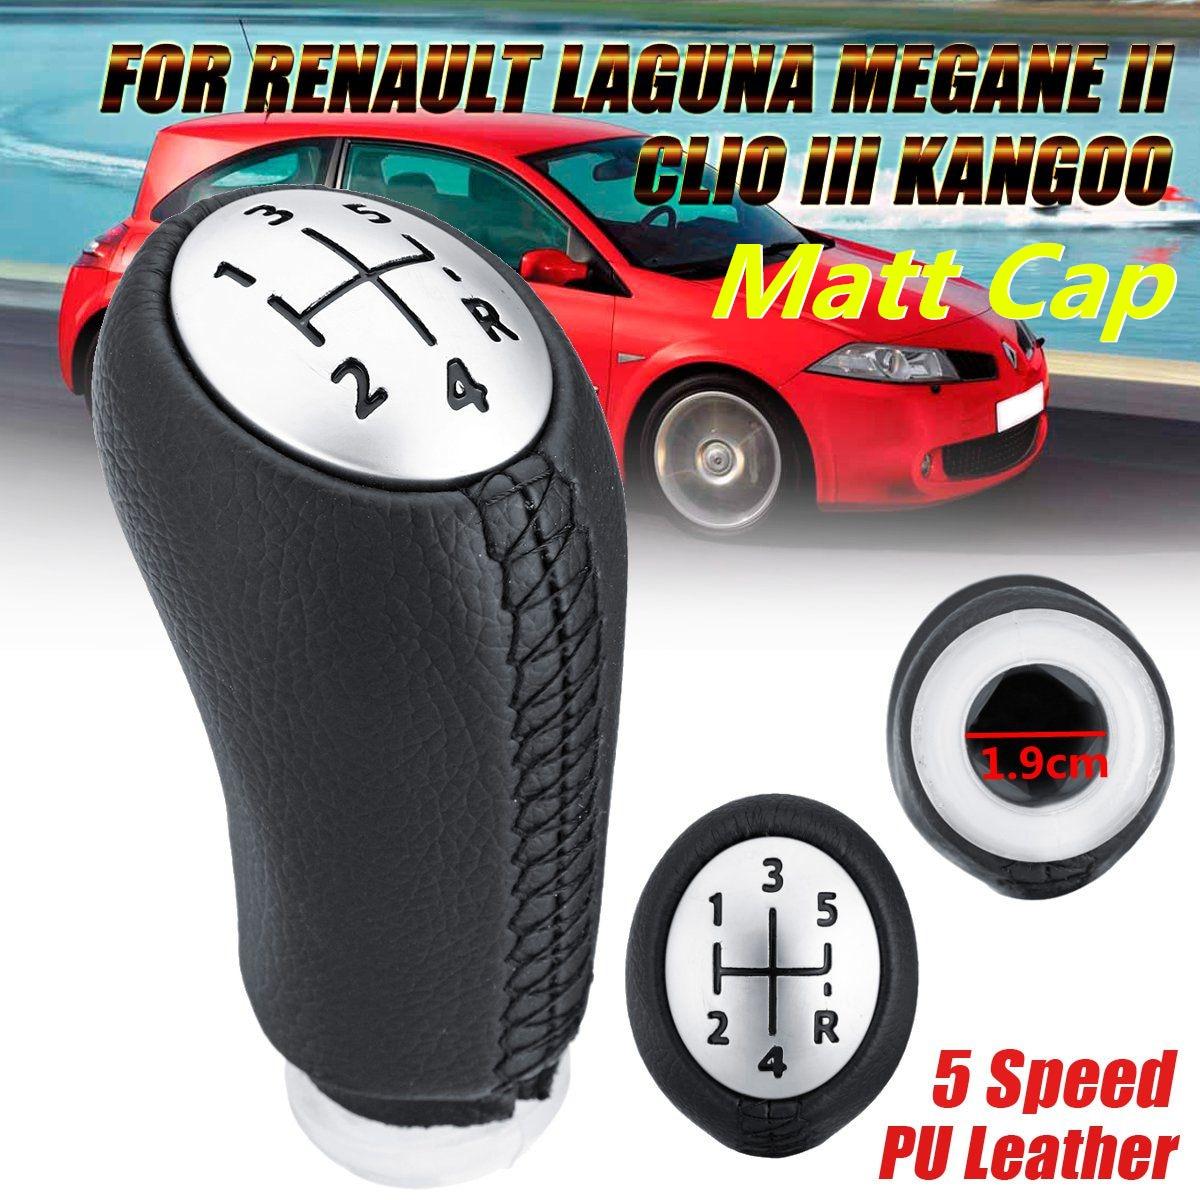 Leather Gloss Matt Cap 5 Speed Car Gear Shift Knob Stick For Renault Laguna Megane 2 Clio 3 2003-2009 Kangoo 2009 Replacement